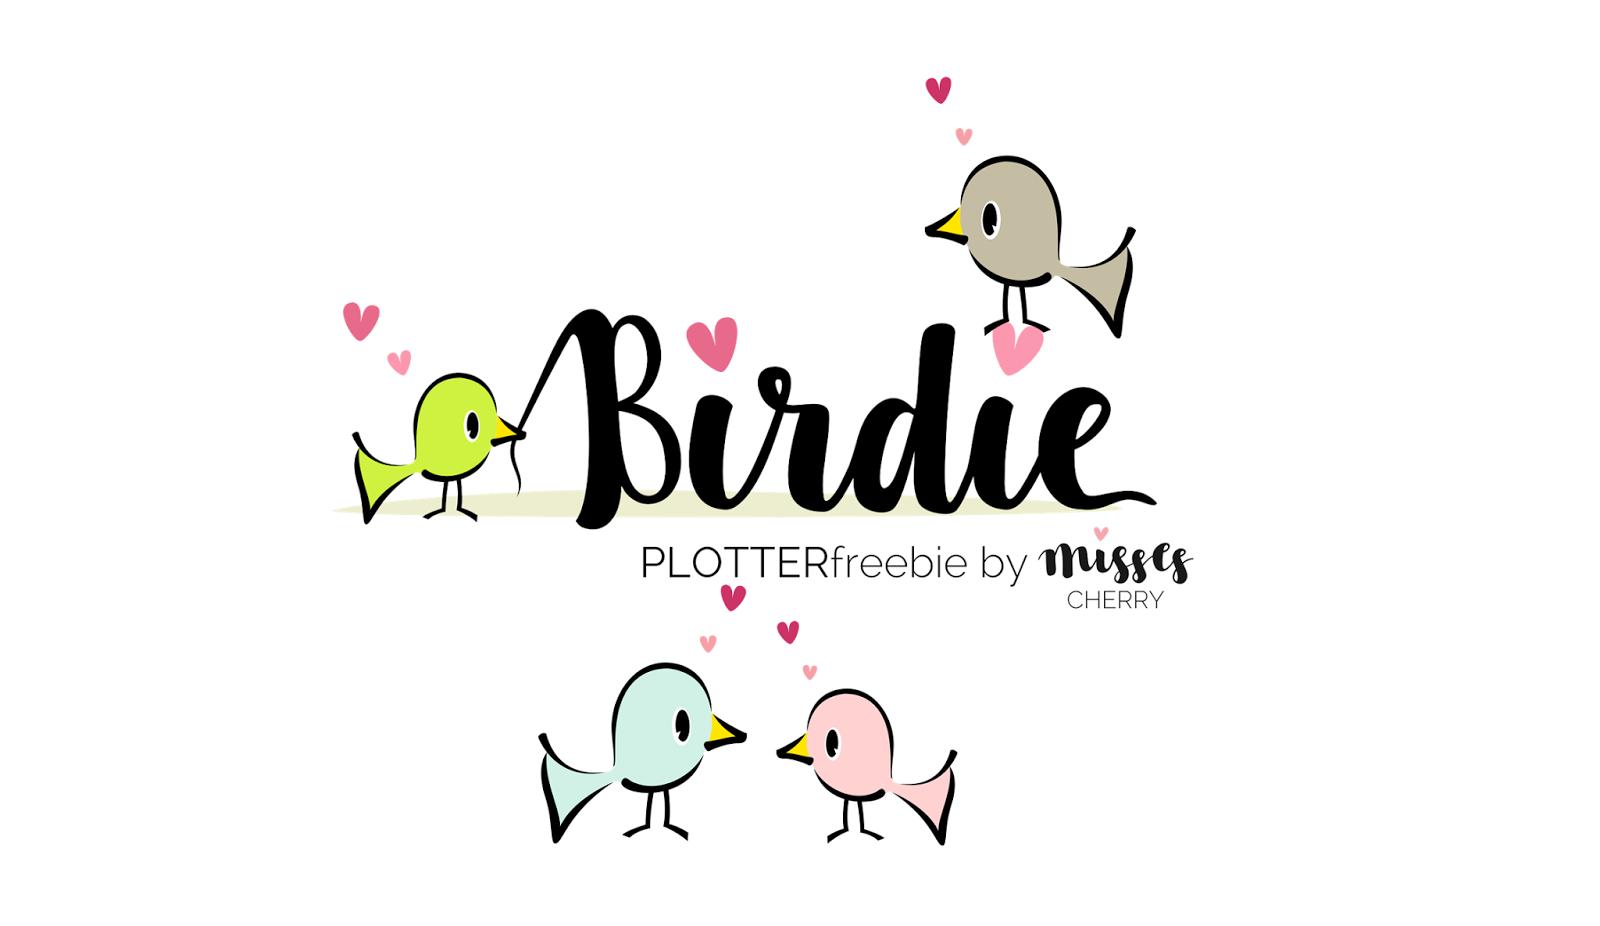 Birdie Plotterdatei, Plotten, Schablonen